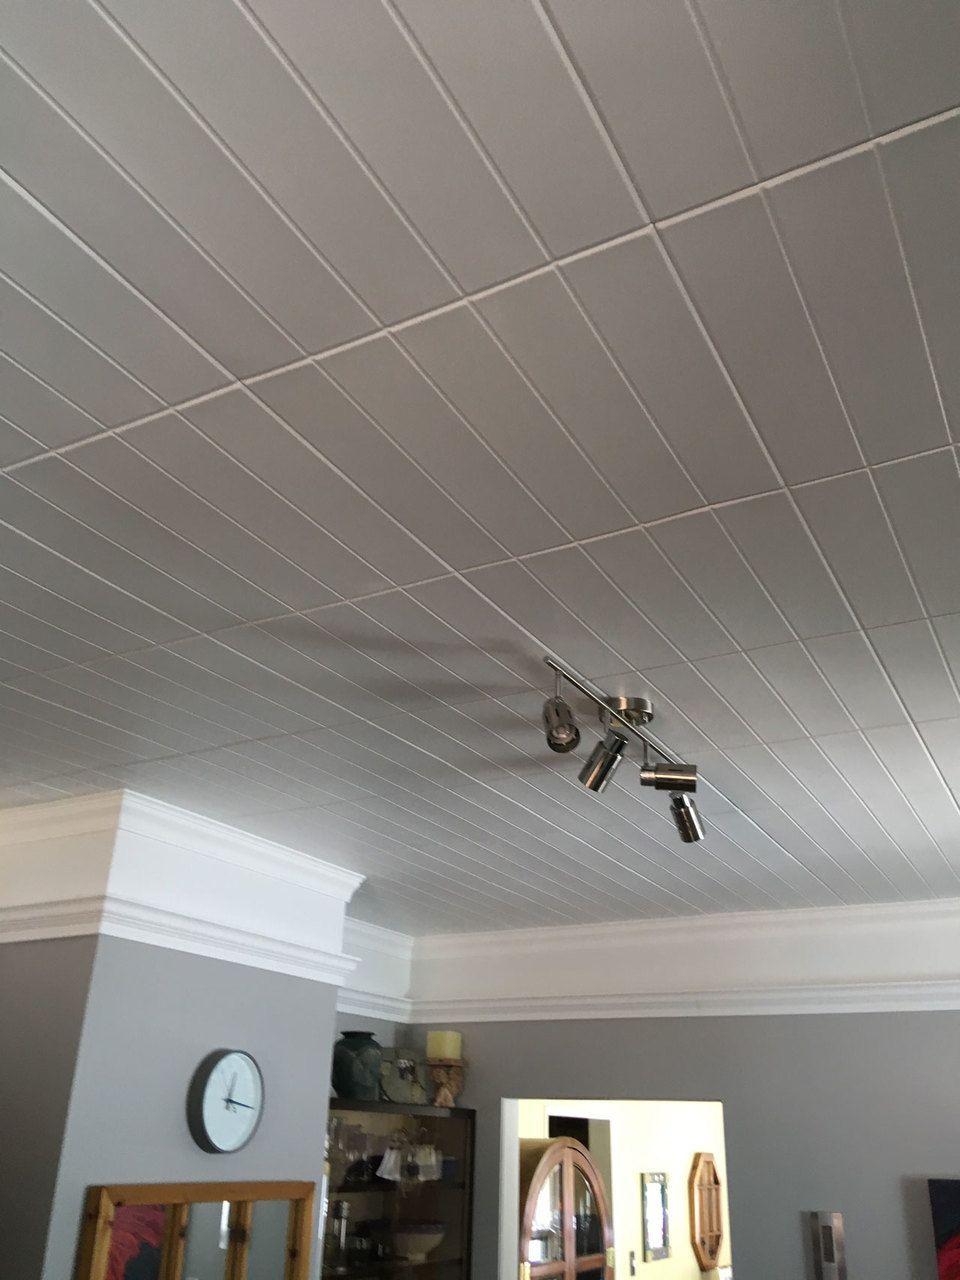 Bead Board Glue Up Styrofoam Ceiling Tile 20 In X 20 In R104 Styrofoam Ceiling Tiles Ceiling Remodel Ceiling Tile